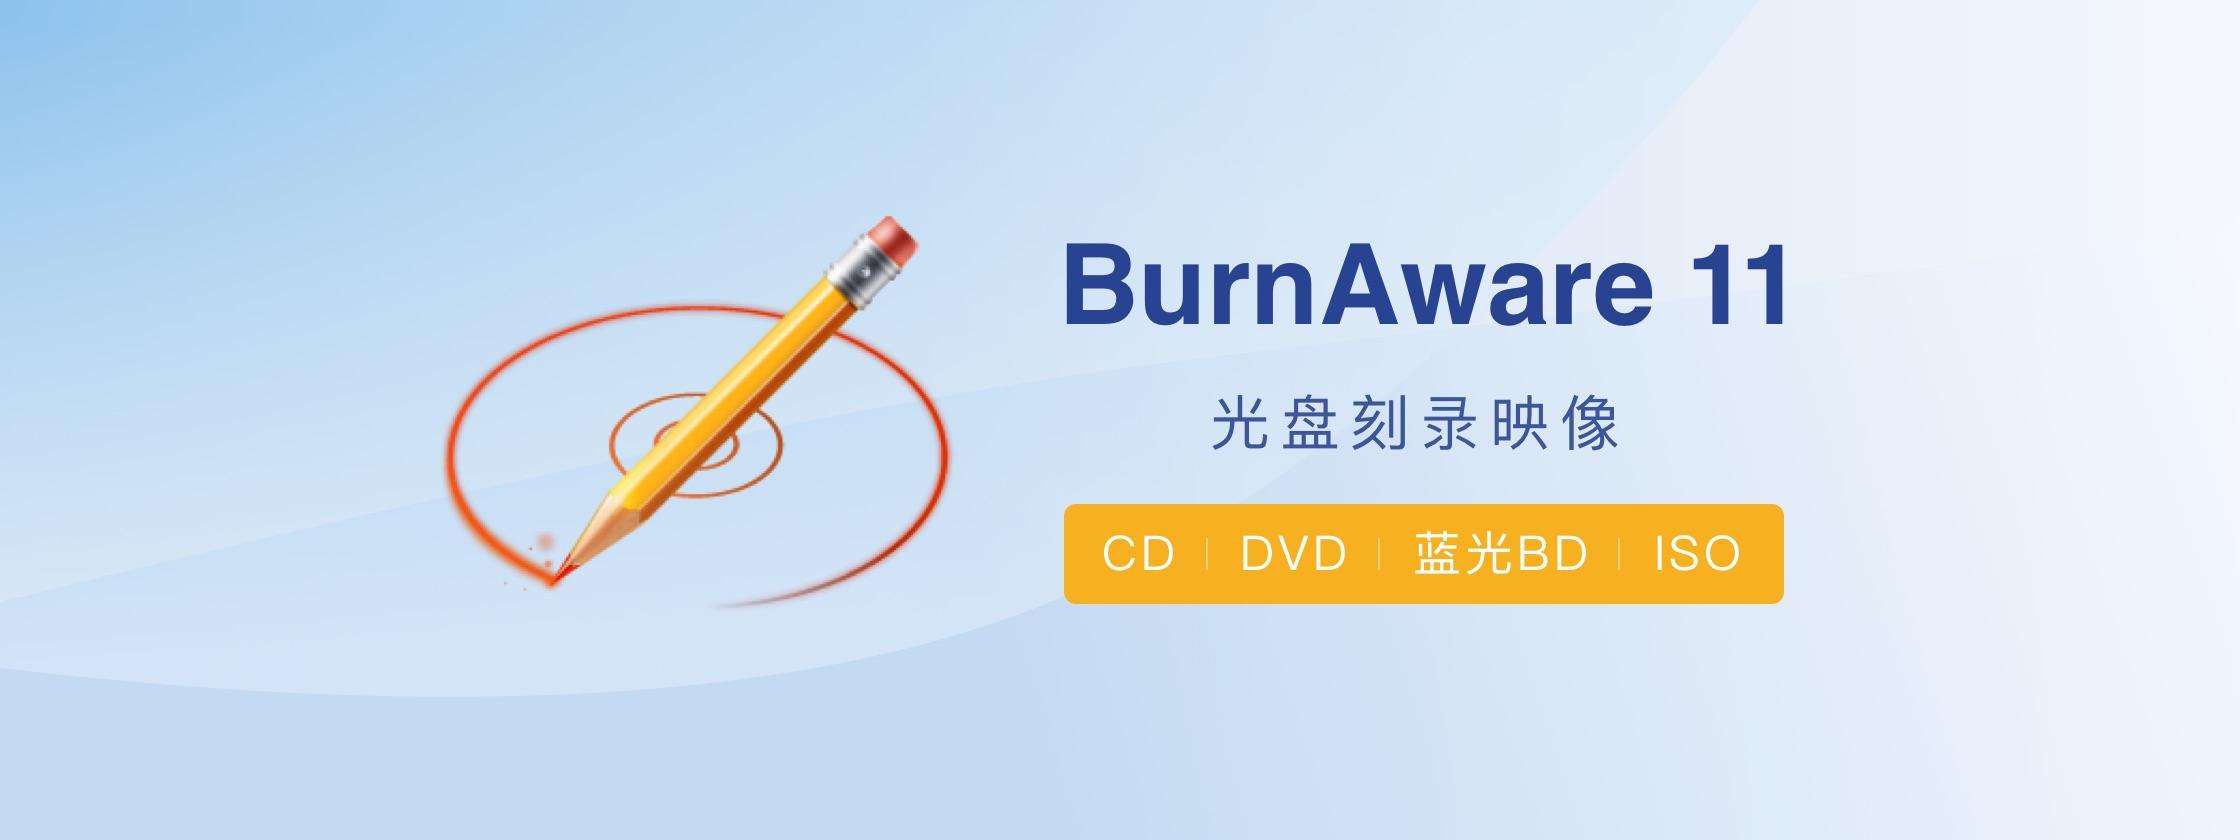 BurnAware,功能强大的光盘刻录工具